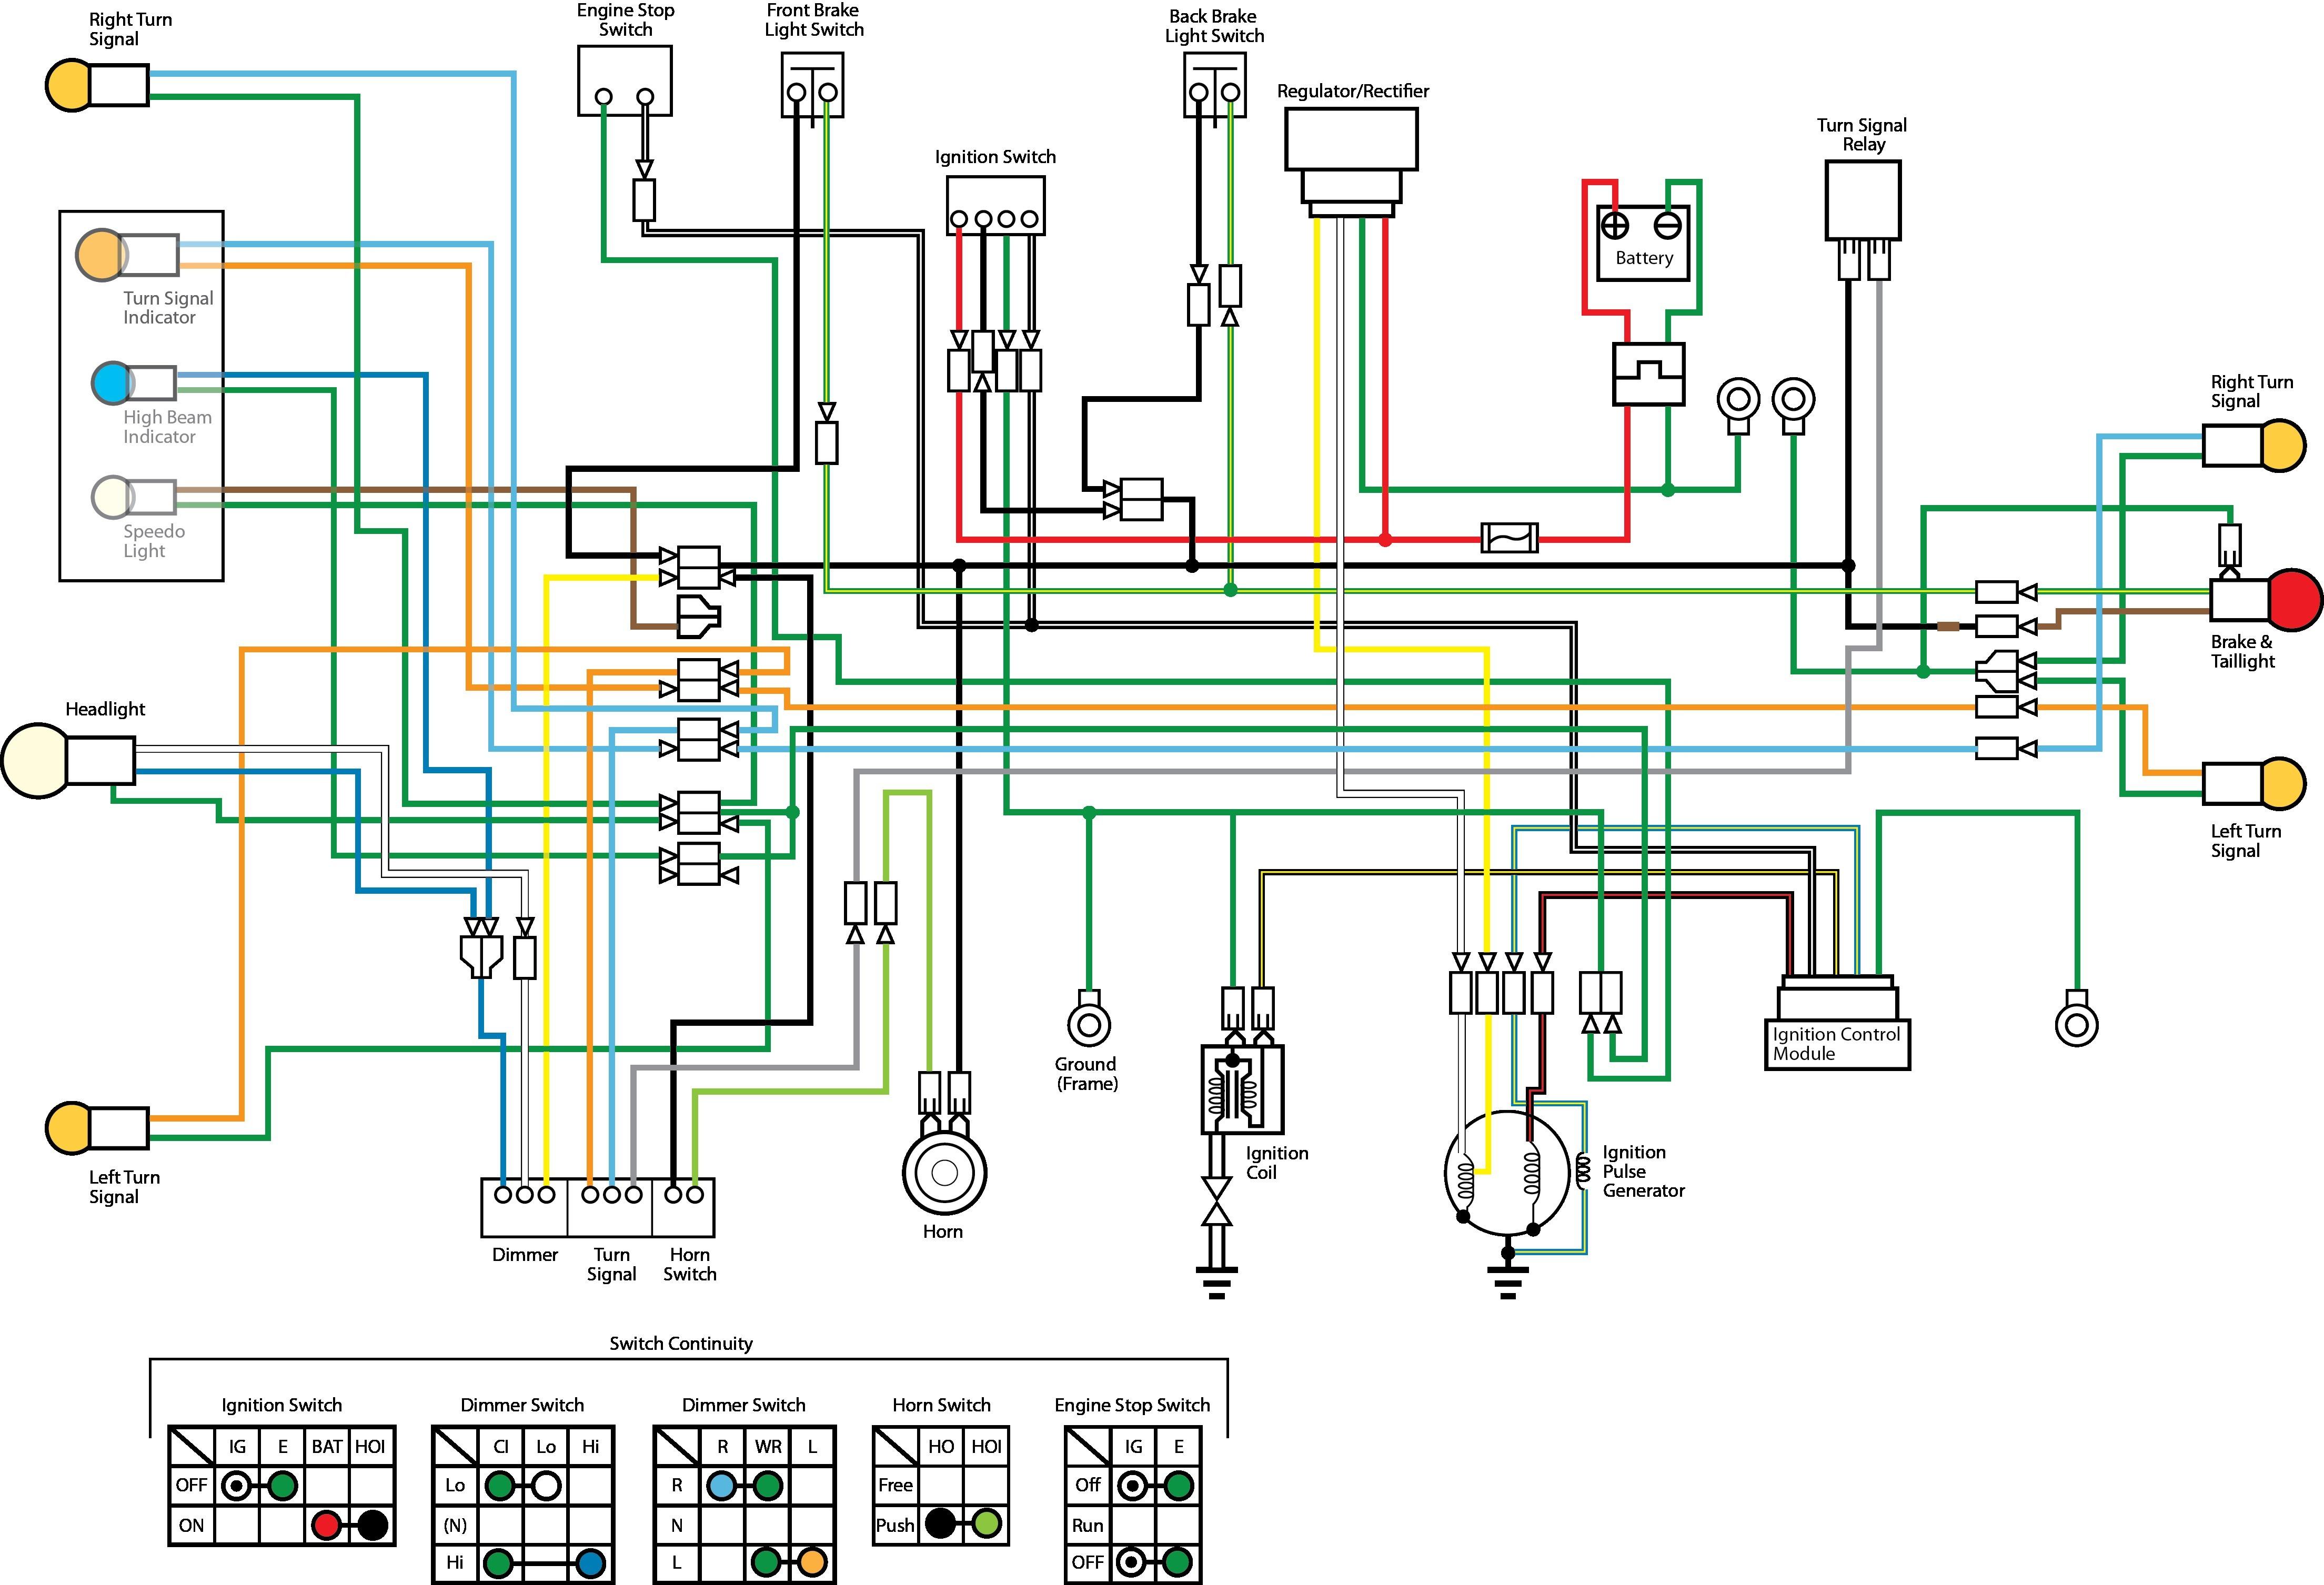 Motorcycle Electrical Diagram Inspirational Electrical Wiring Diagram Diagram Of Motorcycle Electrical Diagram